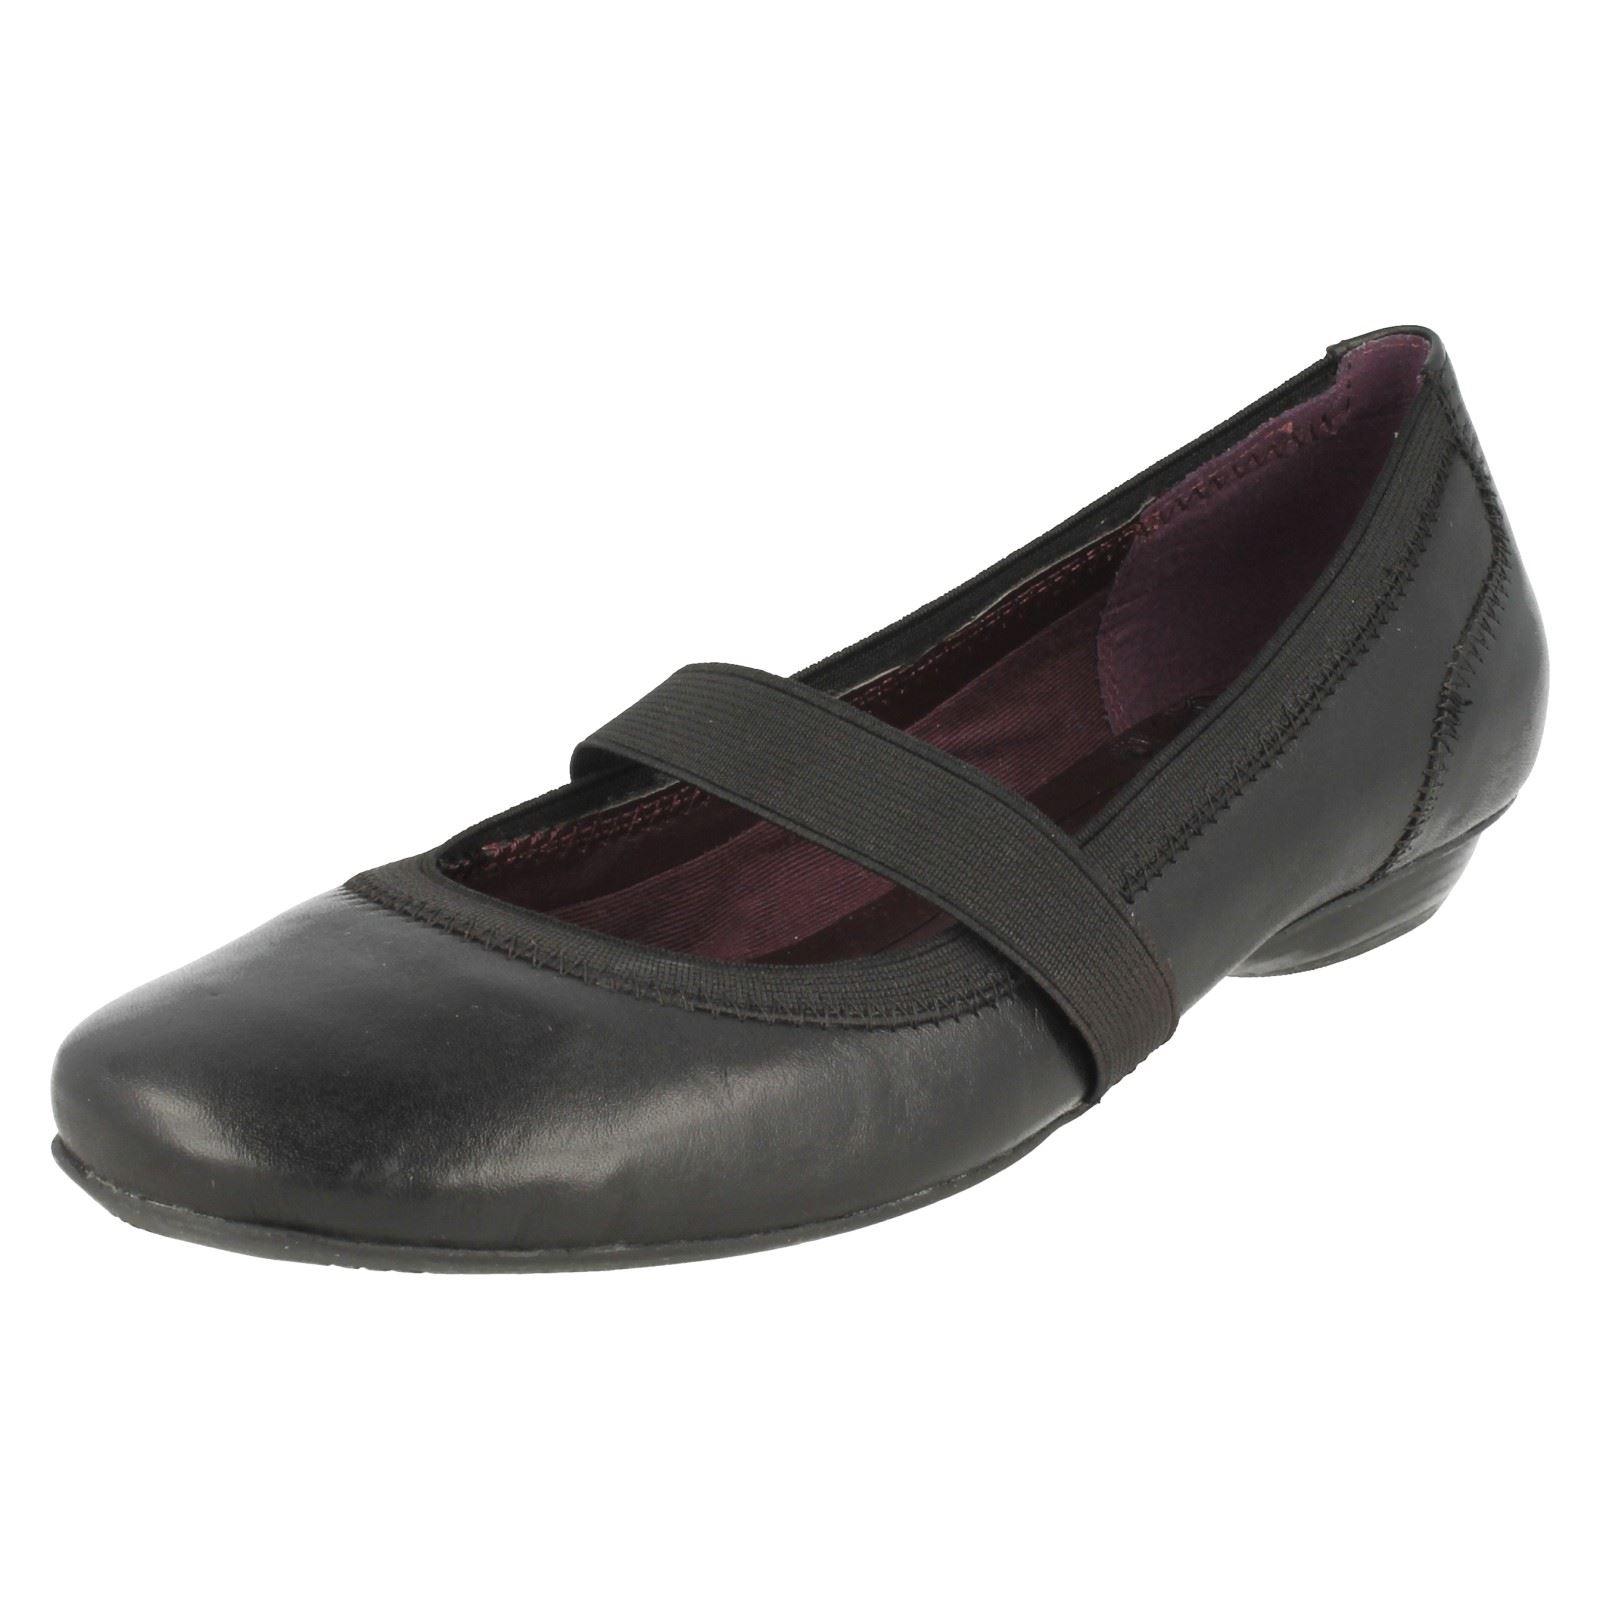 Zapatos Clarks estilo mujer para estilo ballet negro Hallo Star wSqp7